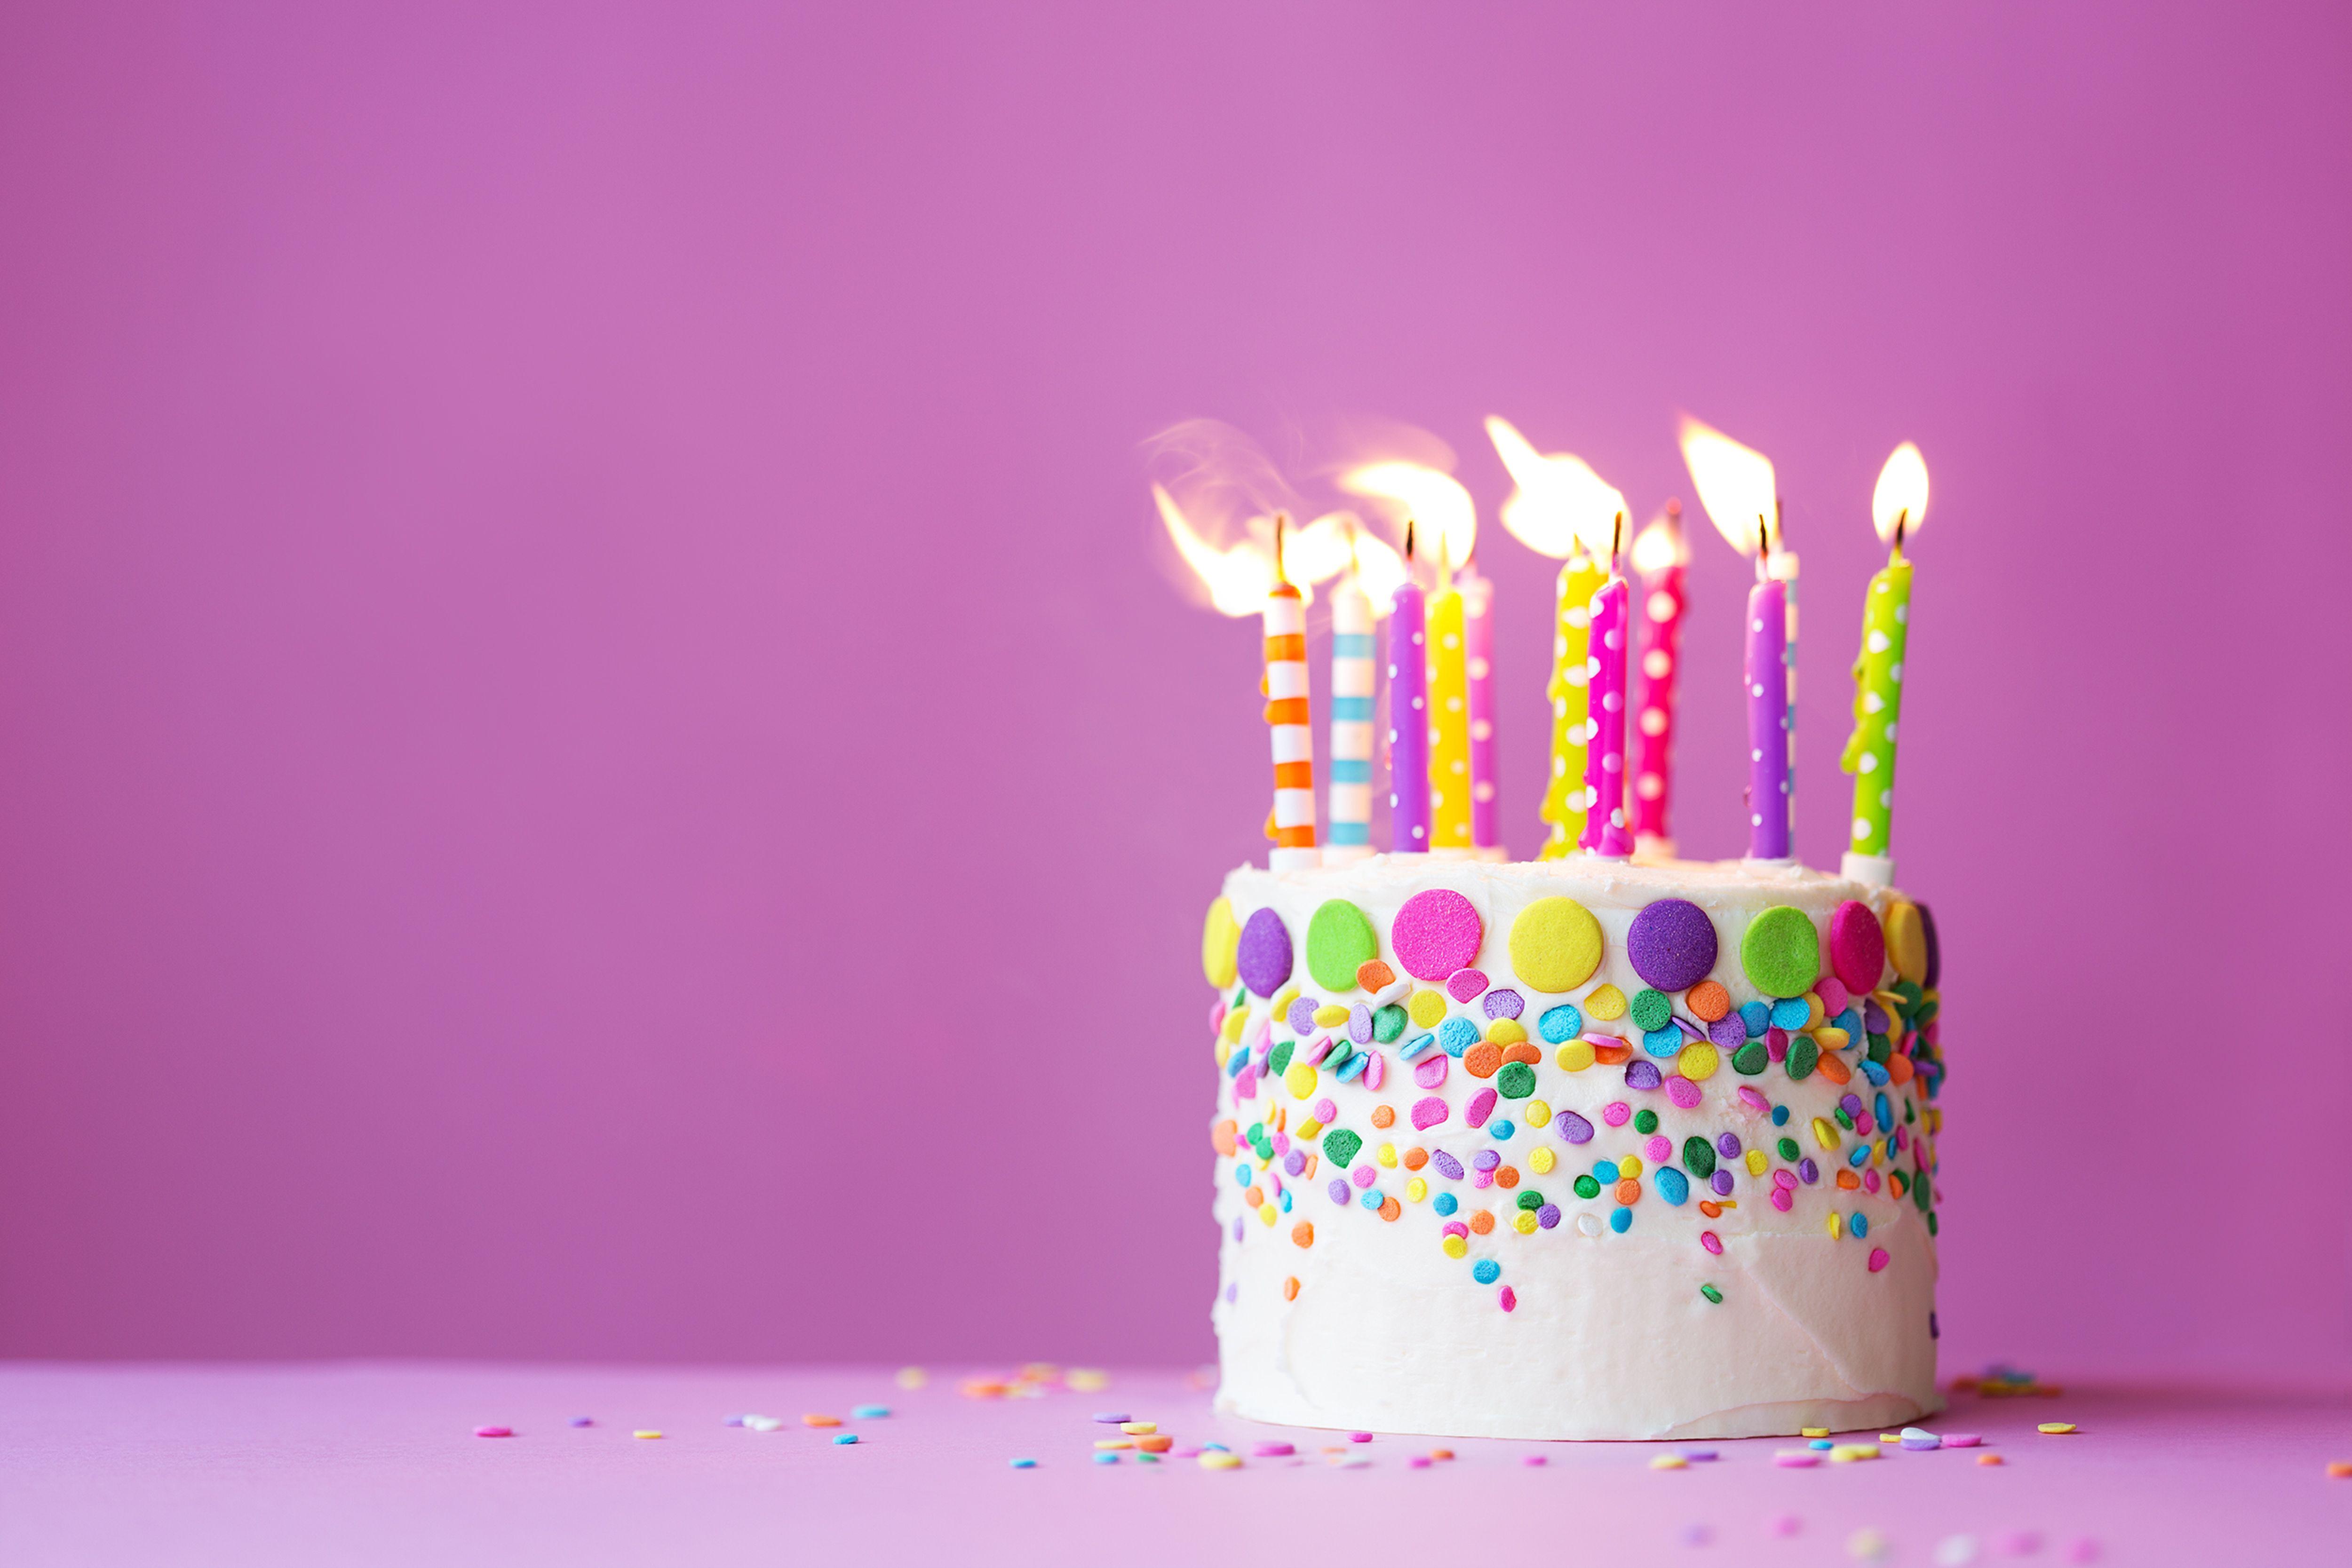 Superb Celebrations 84 Frases De Feliz Cumpleanos Tarjetas De Feliz Funny Birthday Cards Online Elaedamsfinfo